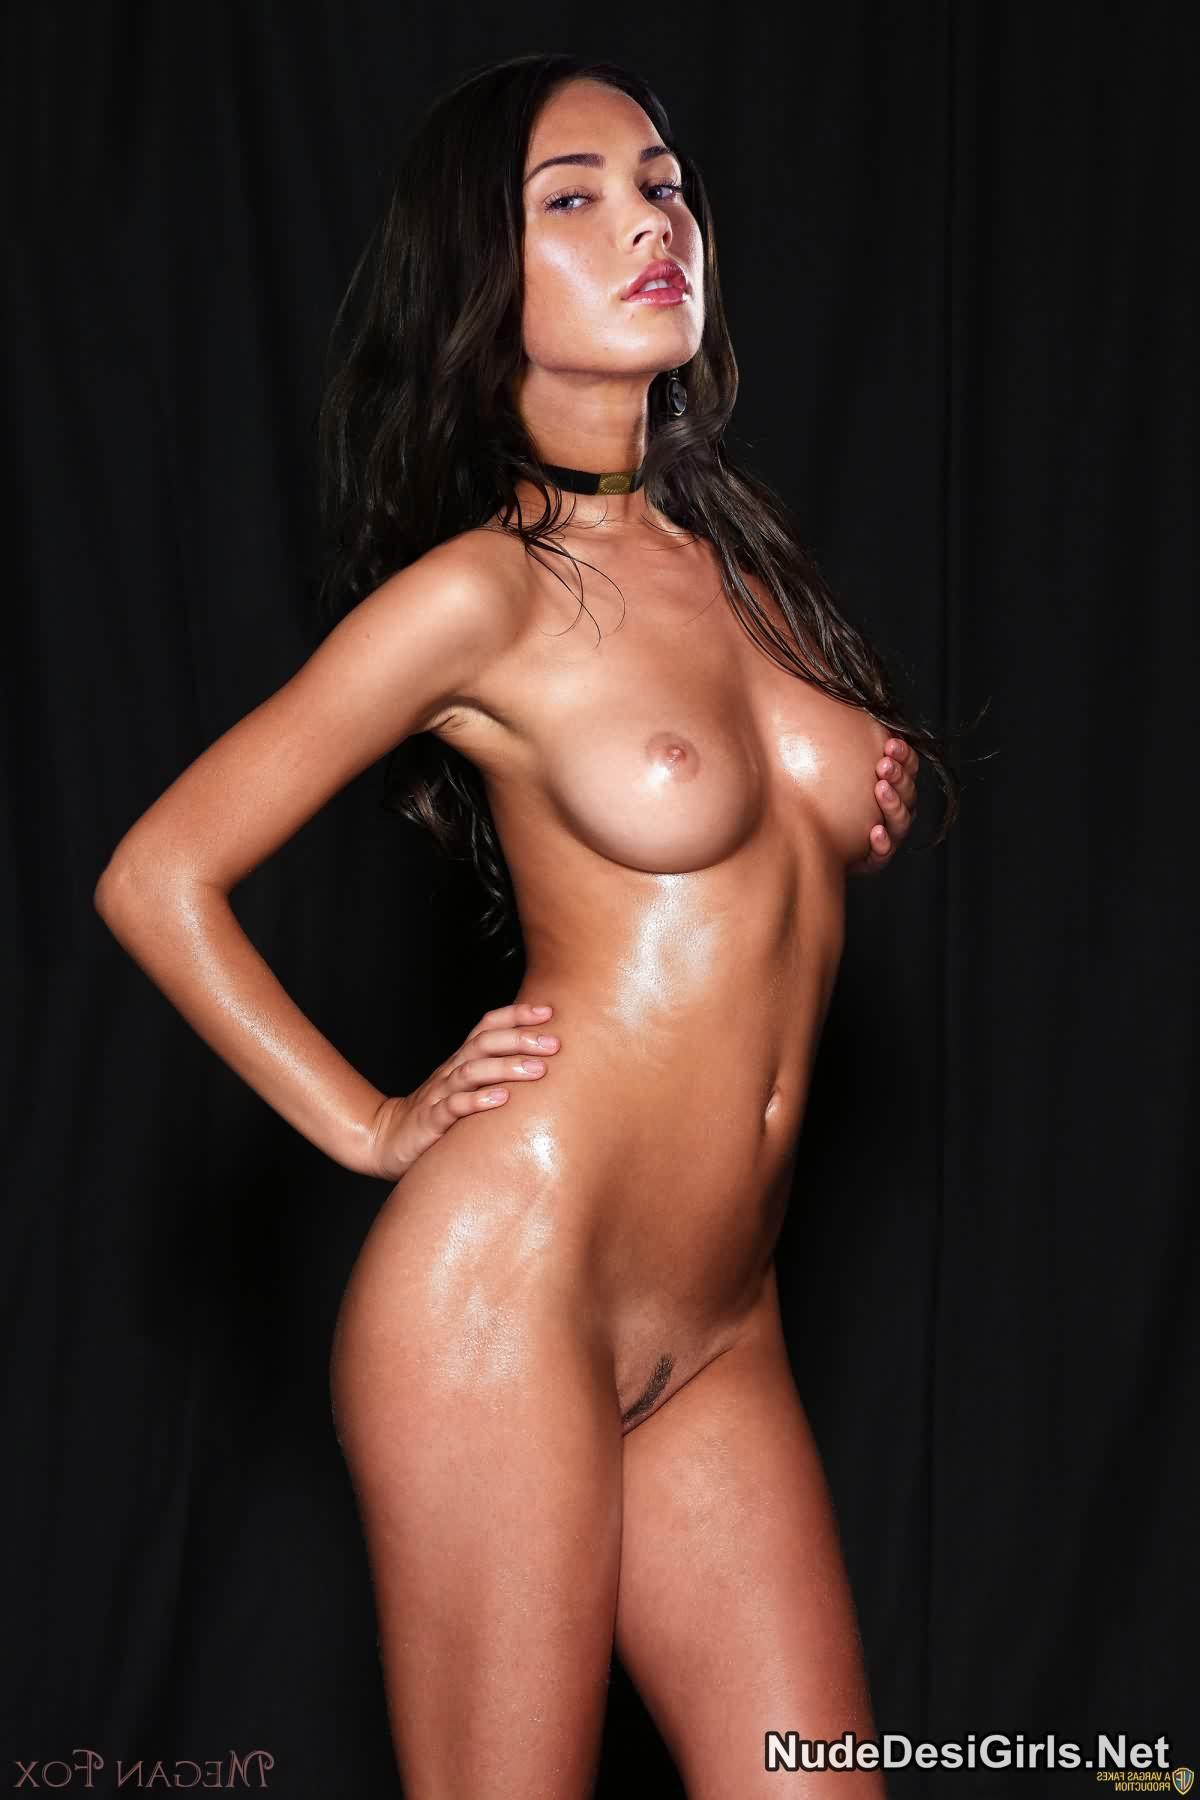 Jorja Fox Nude Pics Megapornxcom